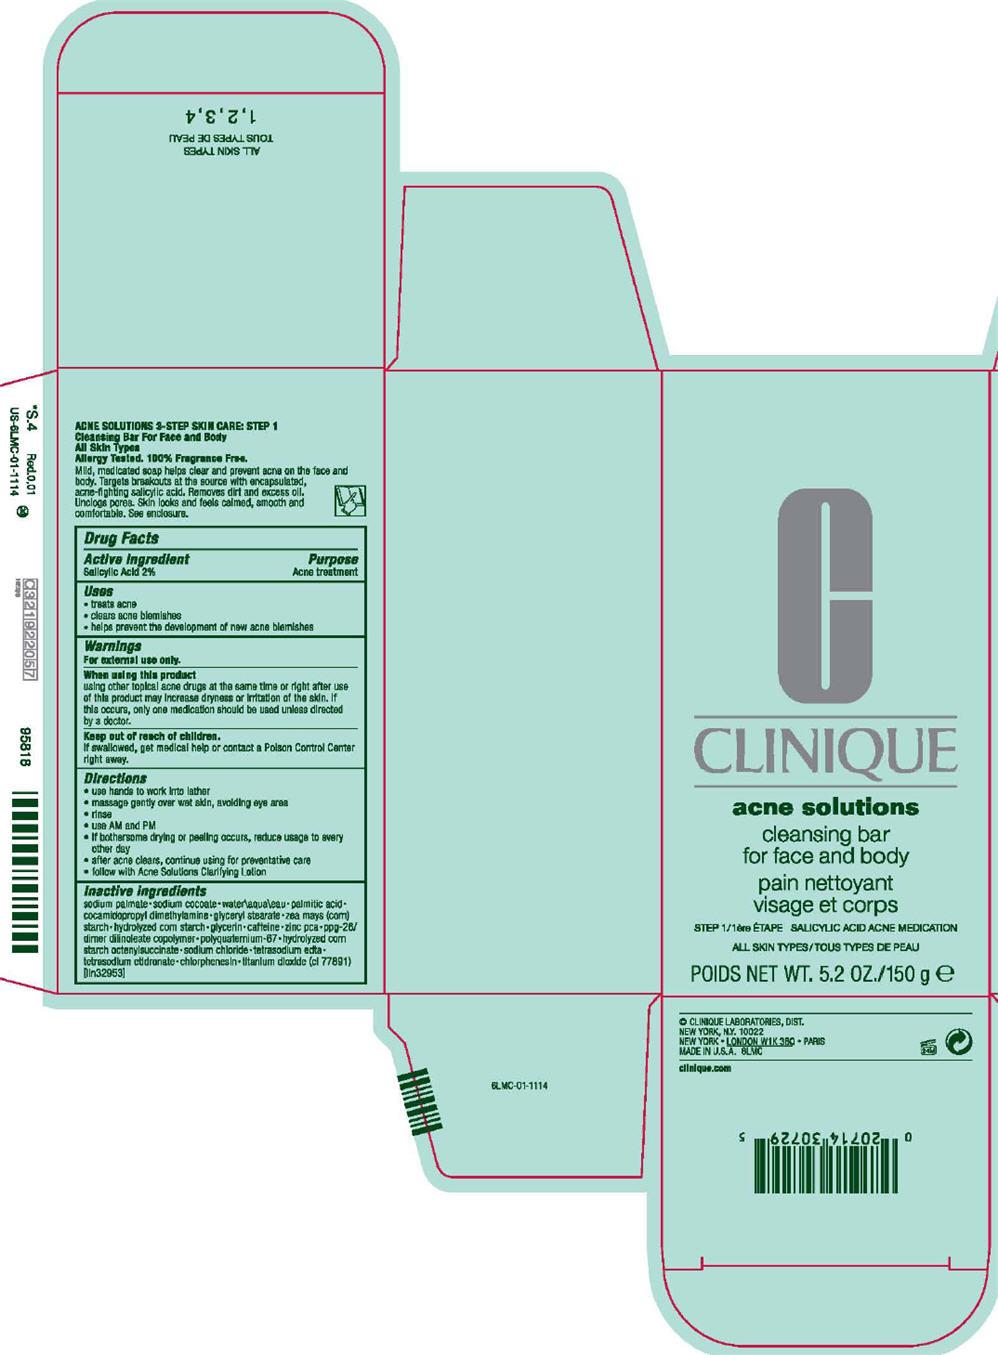 Principal Display Panel - 150 g Carton